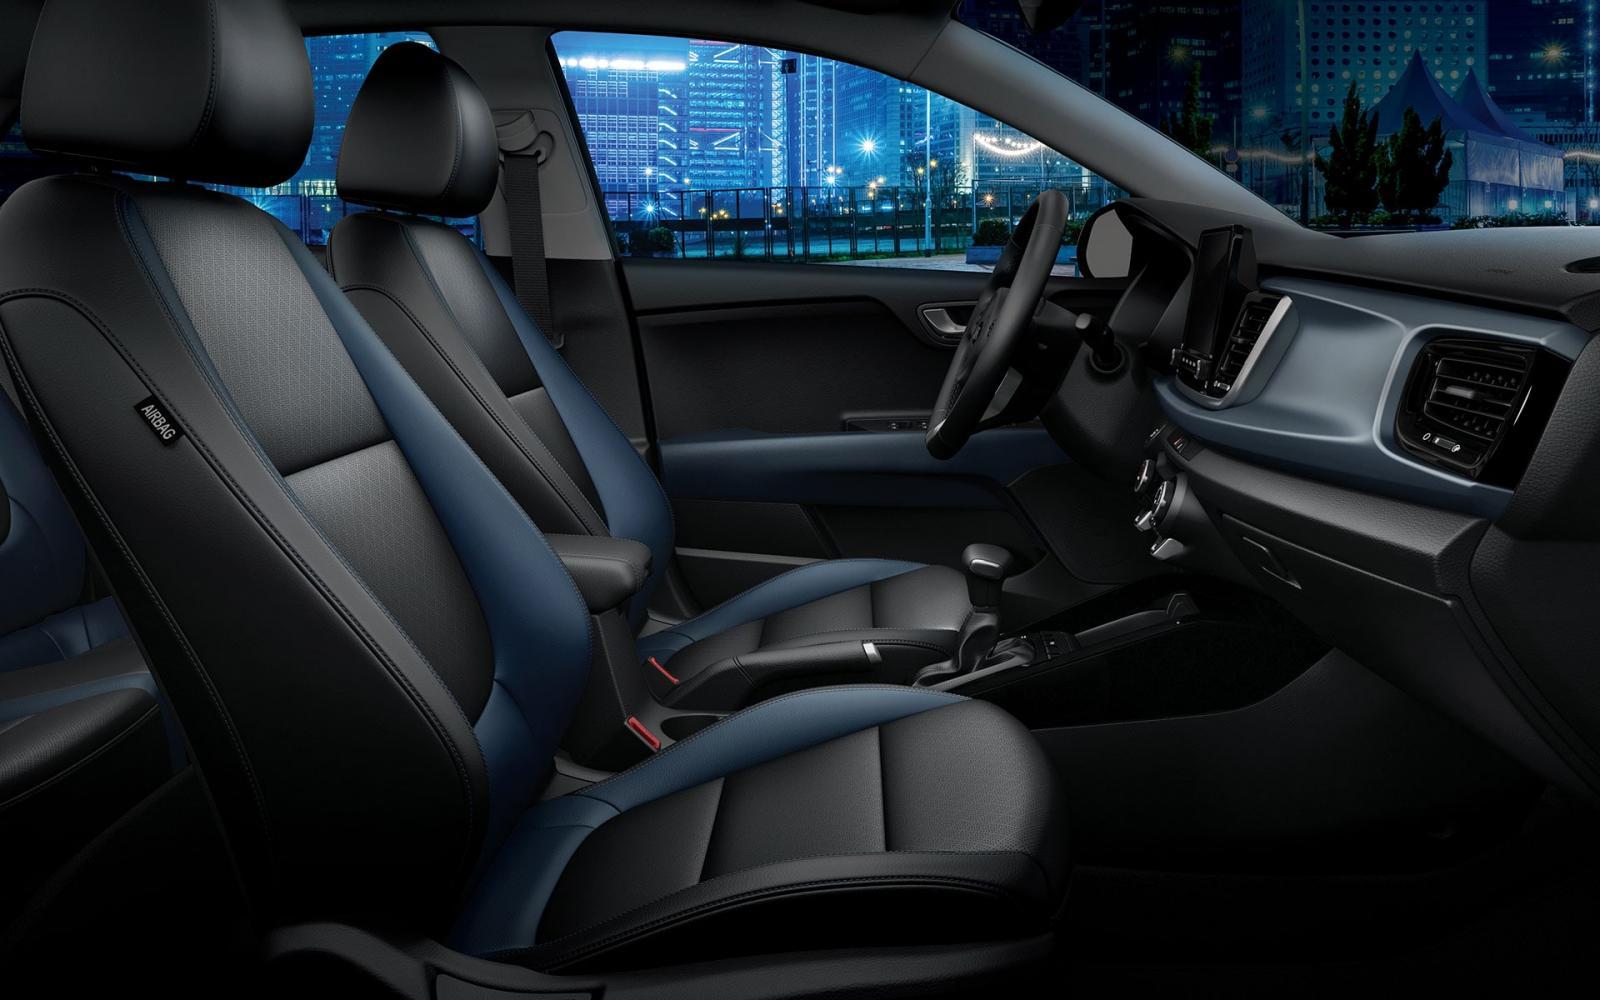 Kia Rio Hatchback S Pack TM 2021 resena opiniones